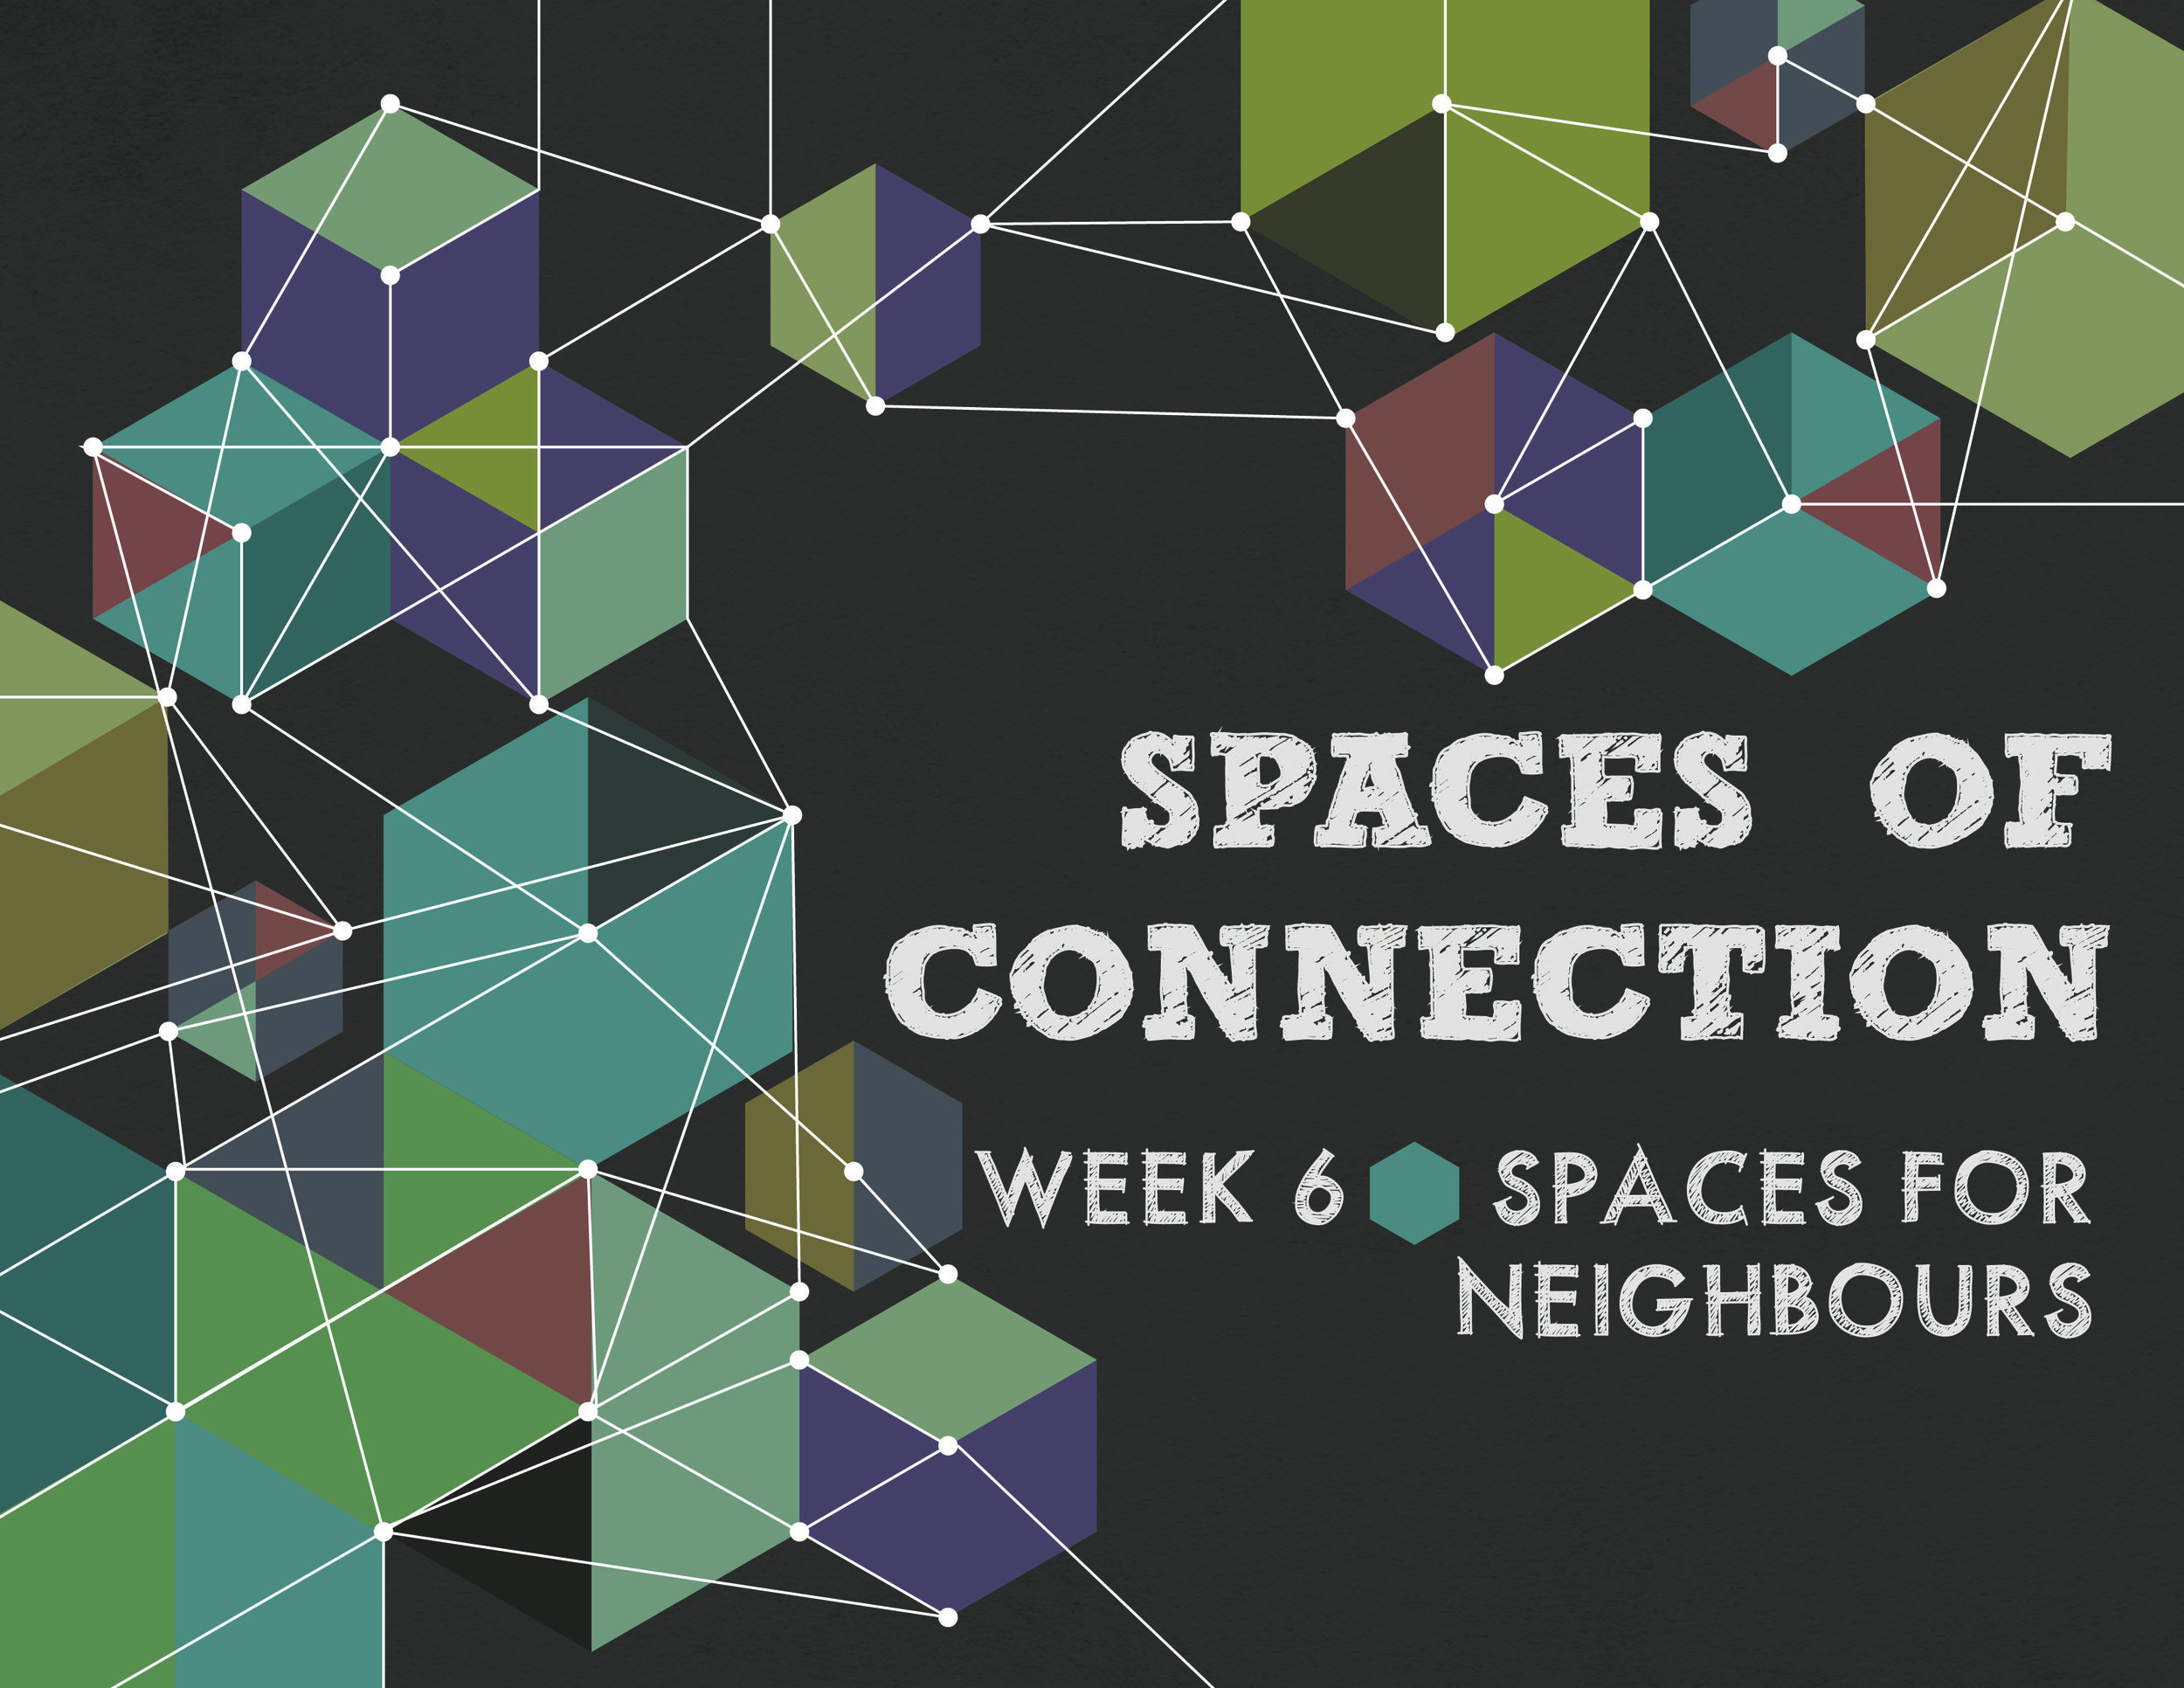 connection sermon-01-01-01-01.jpg